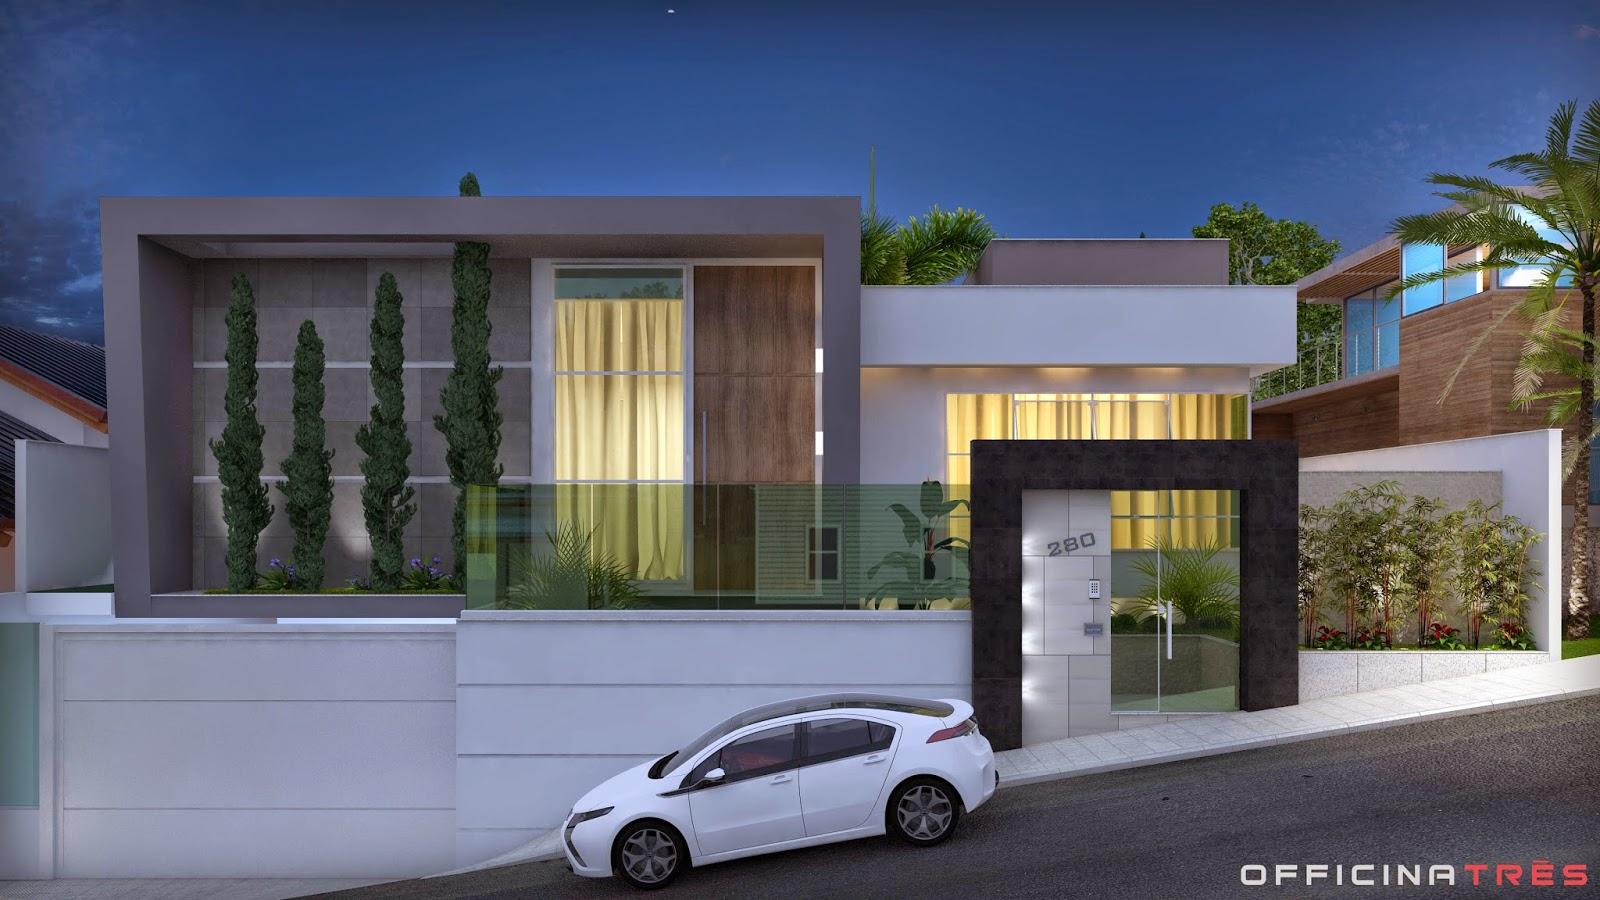 Officinatr s casa moderna loteamento alphaville manhua u mg for Casa moderna 1 8